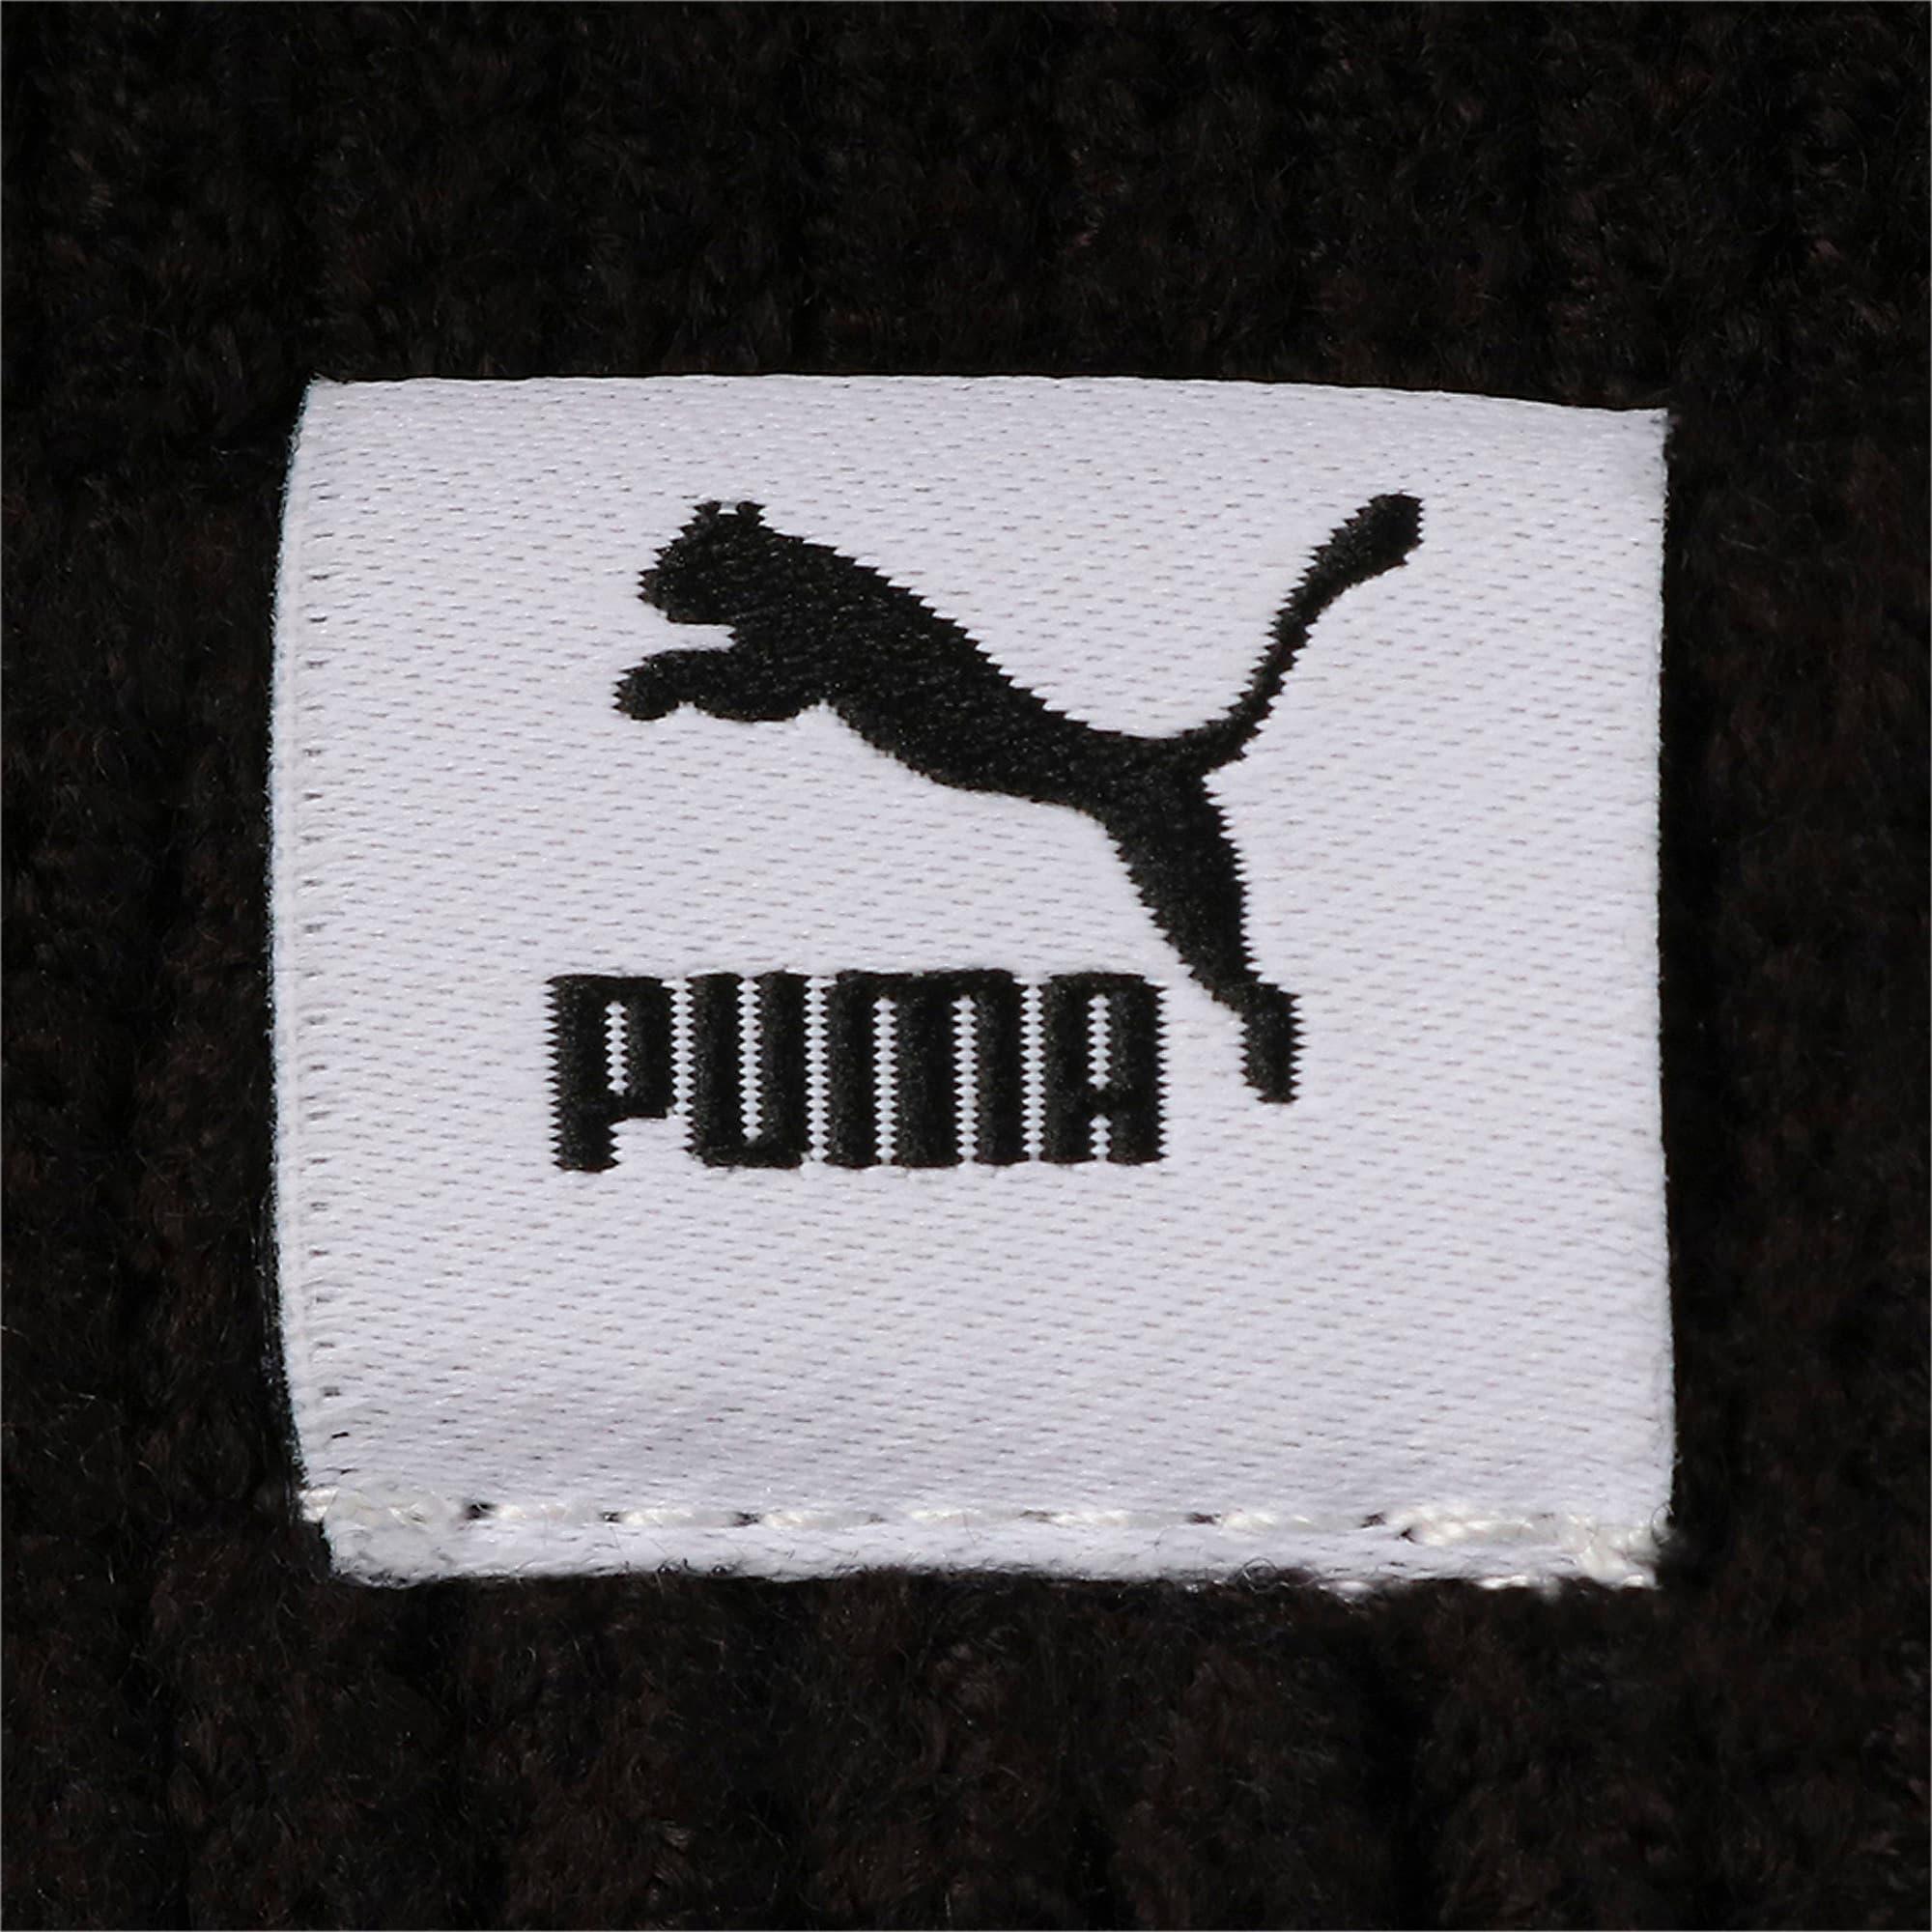 Thumbnail 4 of ハイブリッド フィット ウィメンズ トレンド ビーニー, Puma Black, medium-JPN